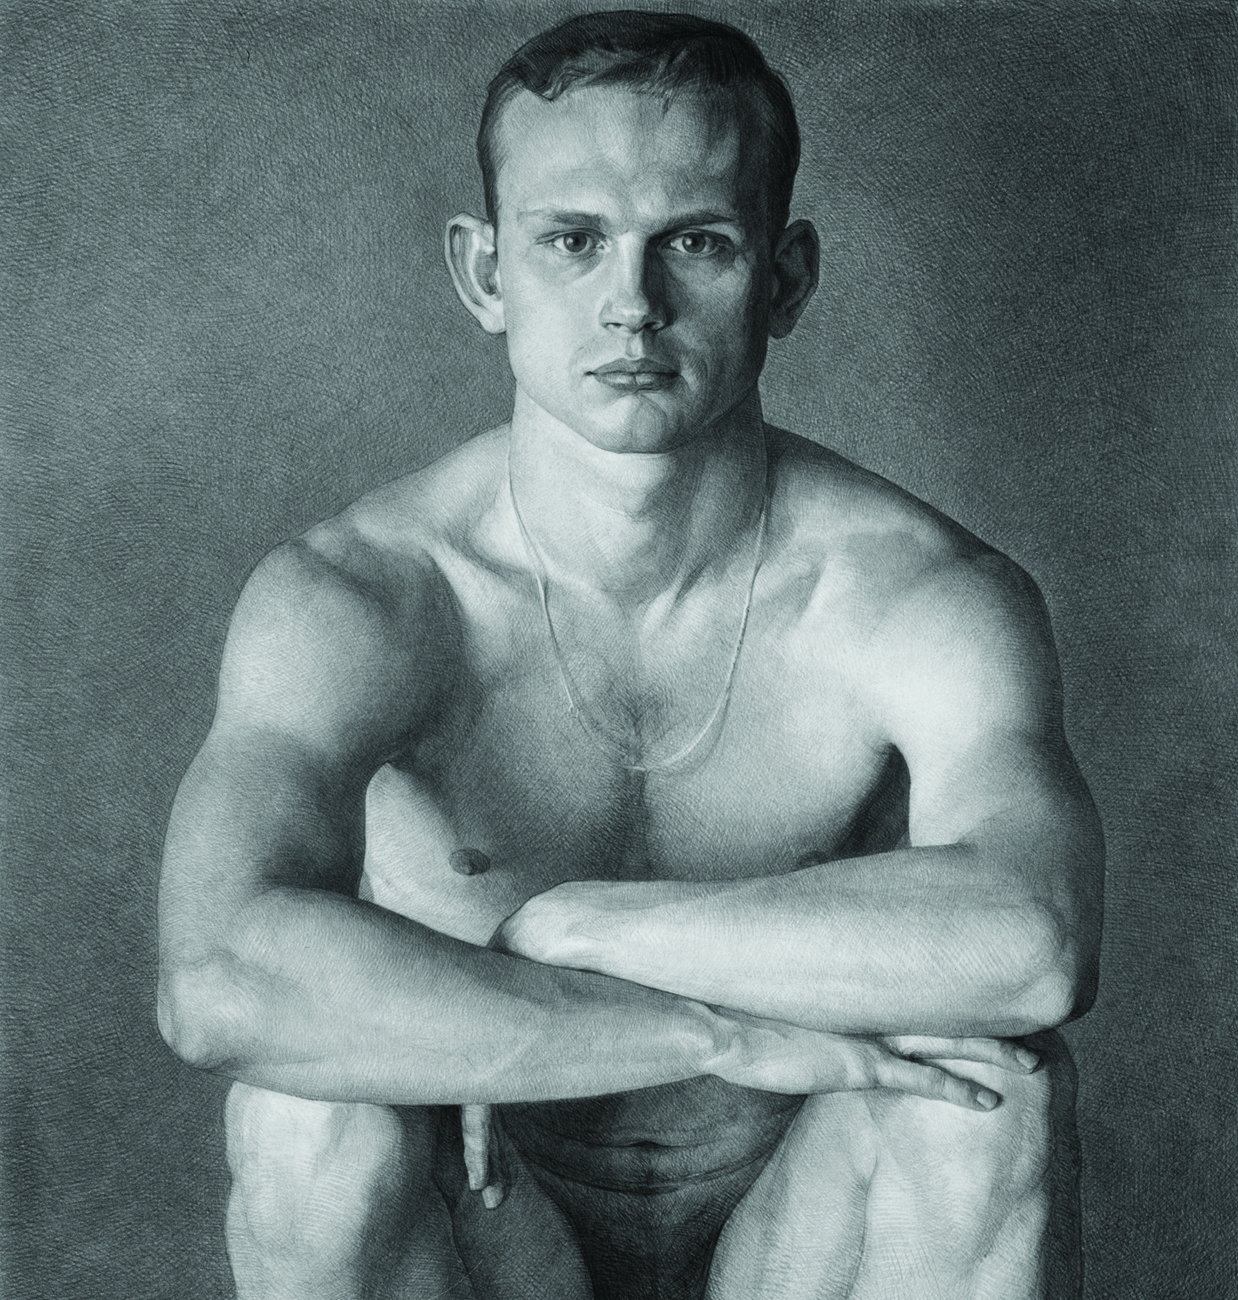 Footballer: pencil on paper, 58x55 cm. 2000.